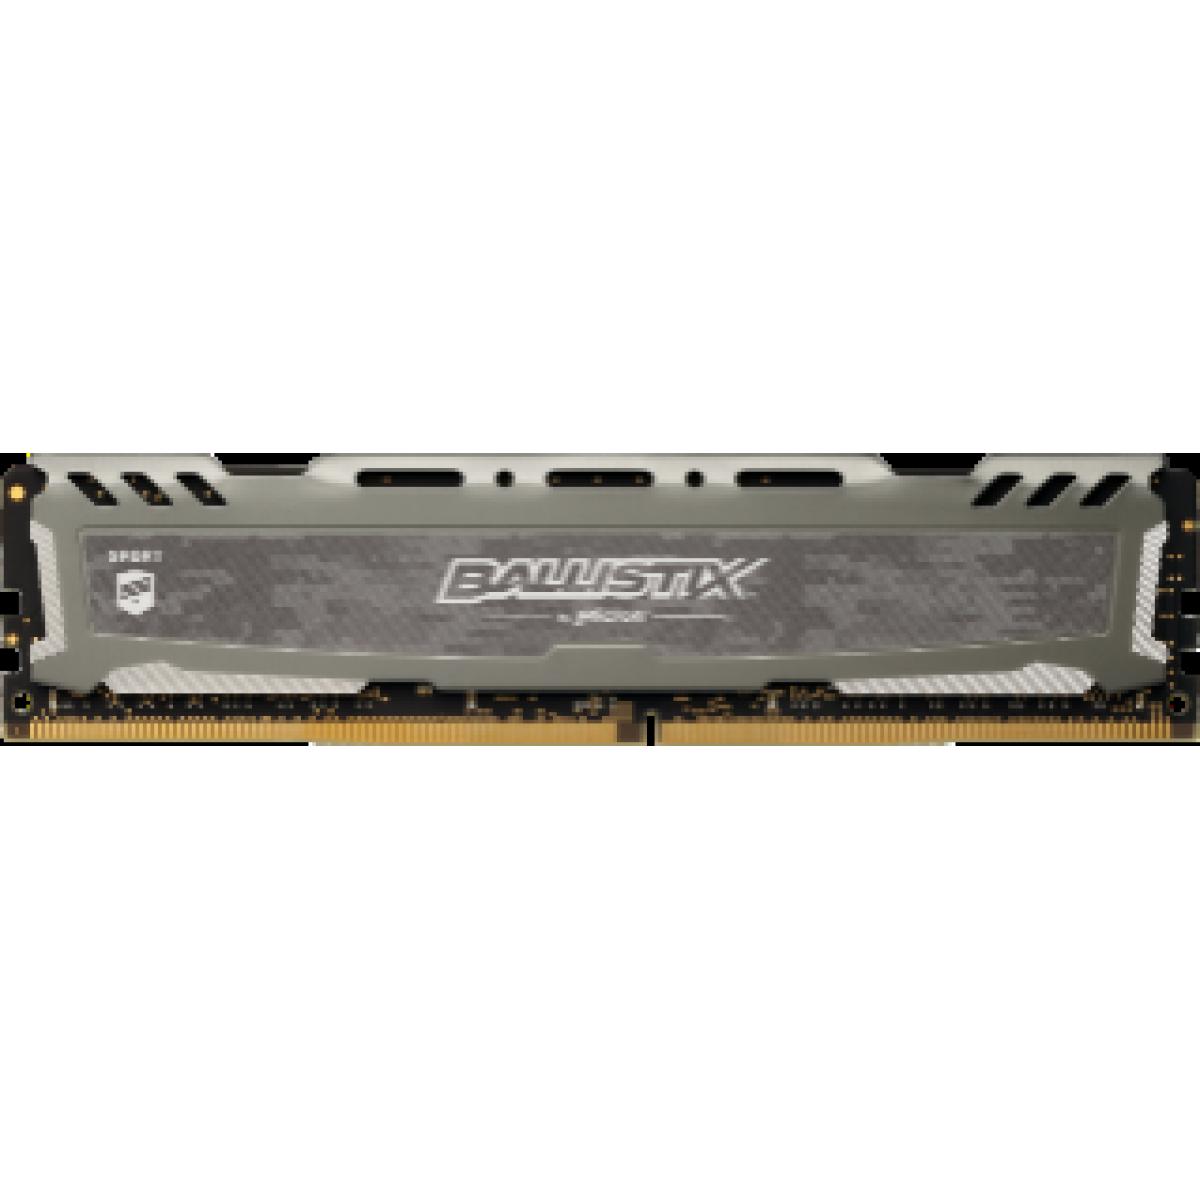 Memória DDR4 Crucial Ballistix Sport Lt, 8GB 3000MHz, Grey, BLS8G4D30AESBK